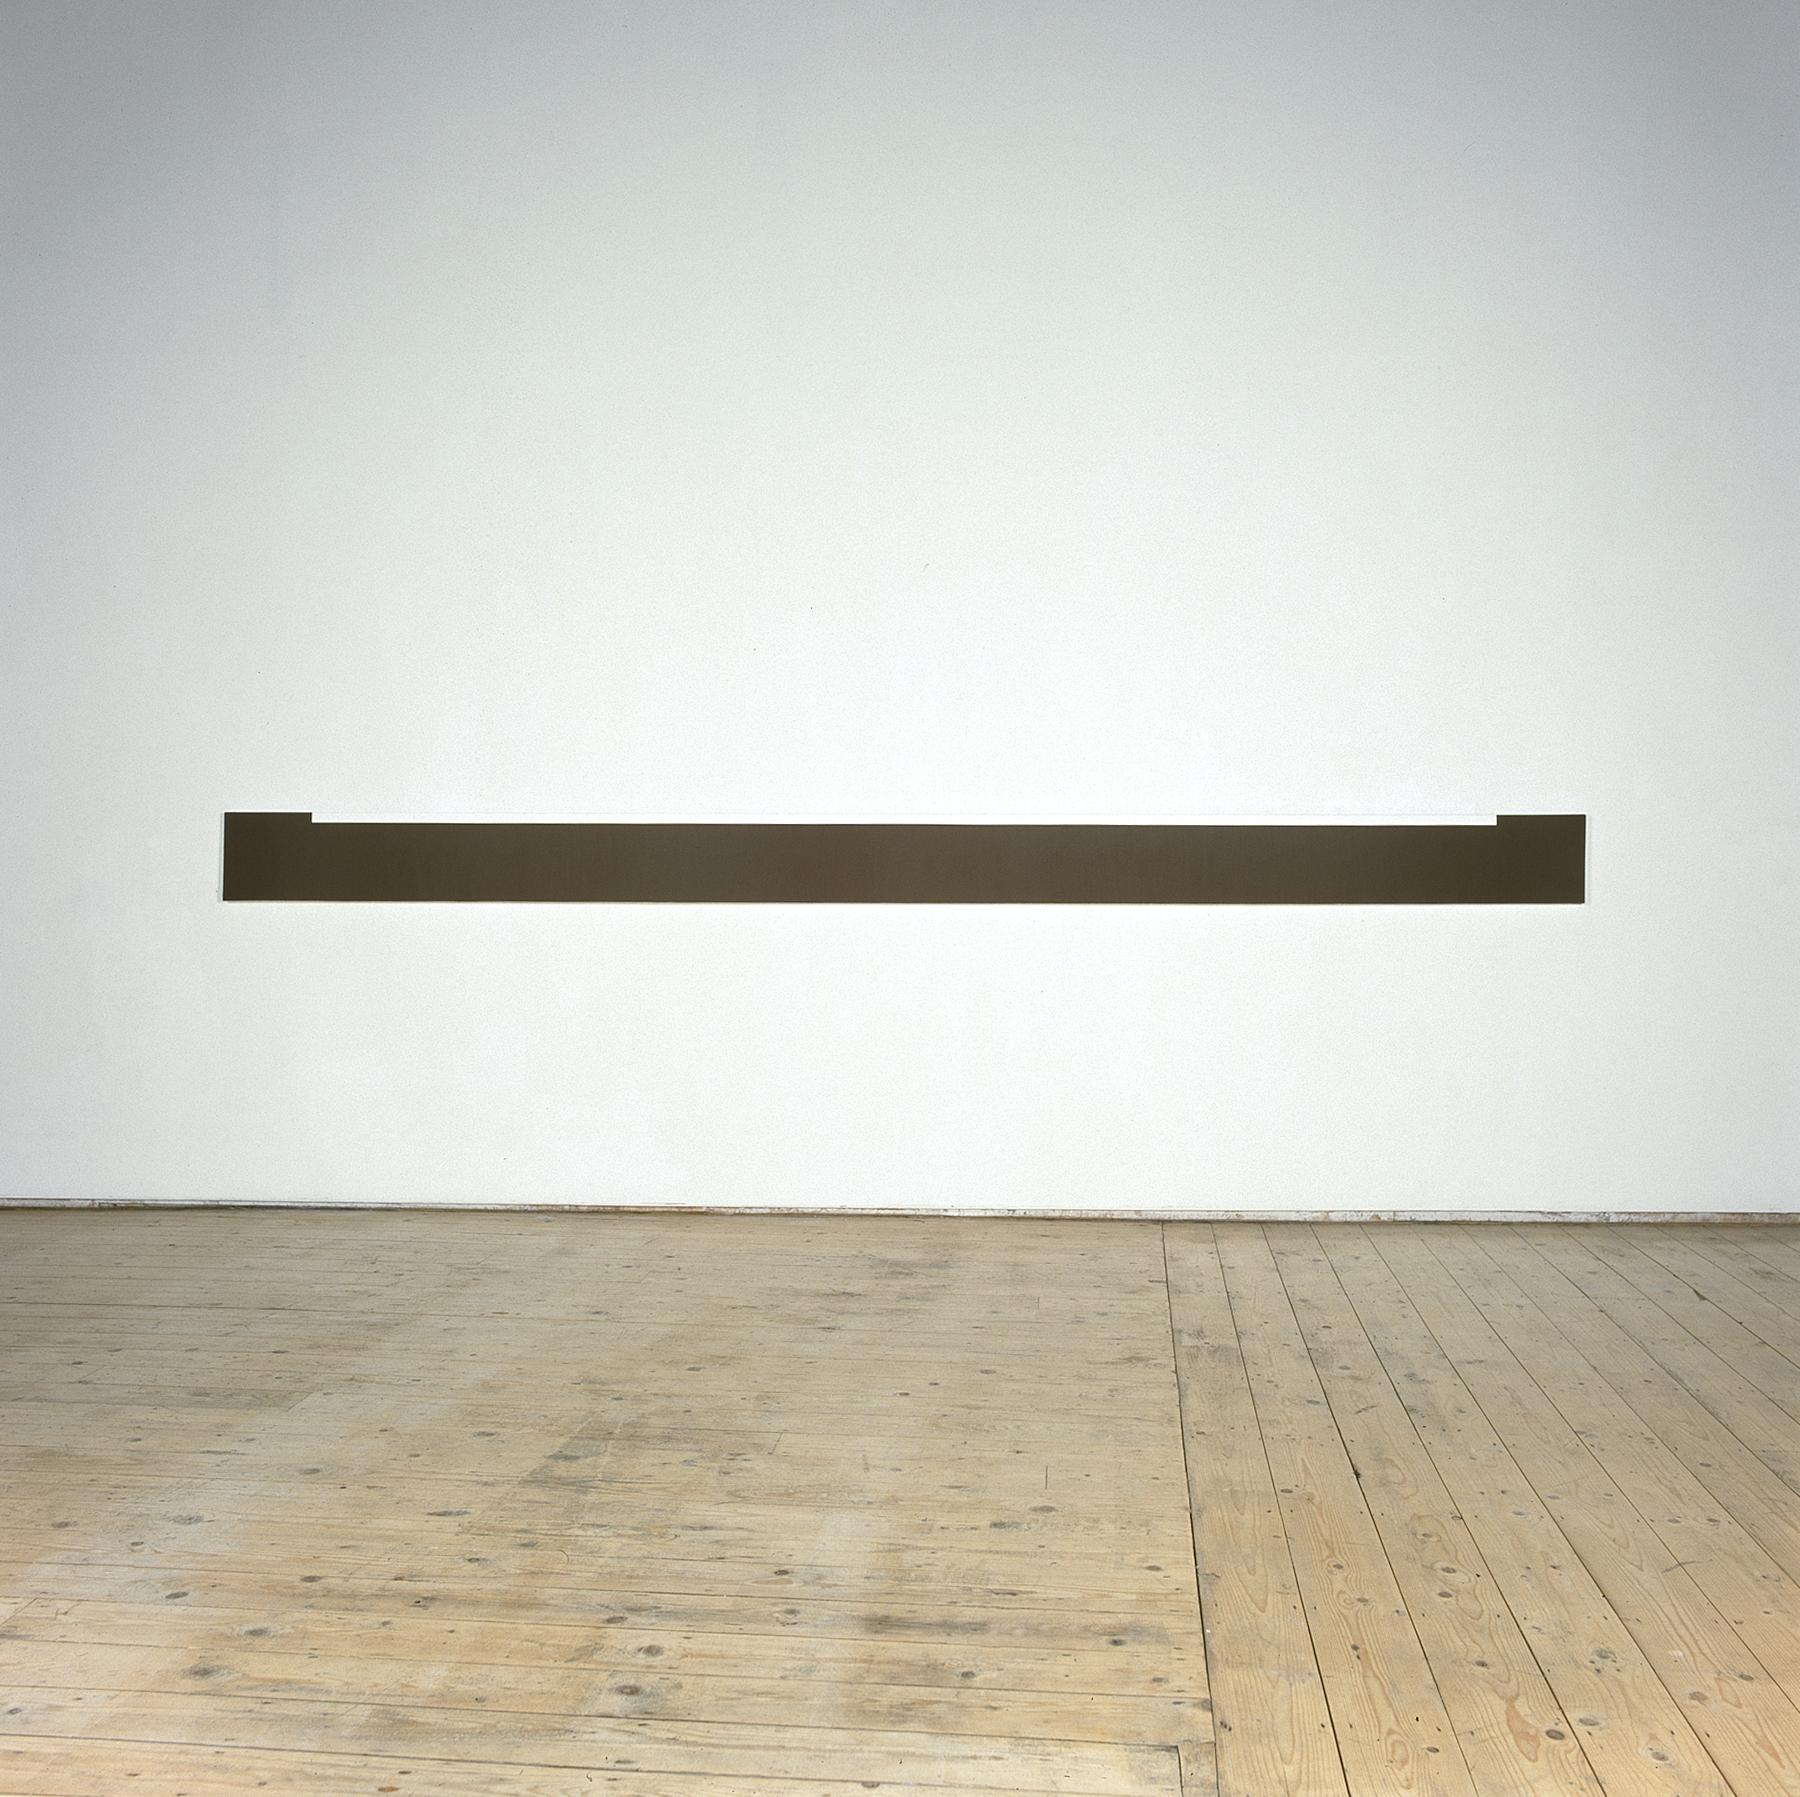 Untitled  1999  Acrylic on canvas  25 x 389 cm